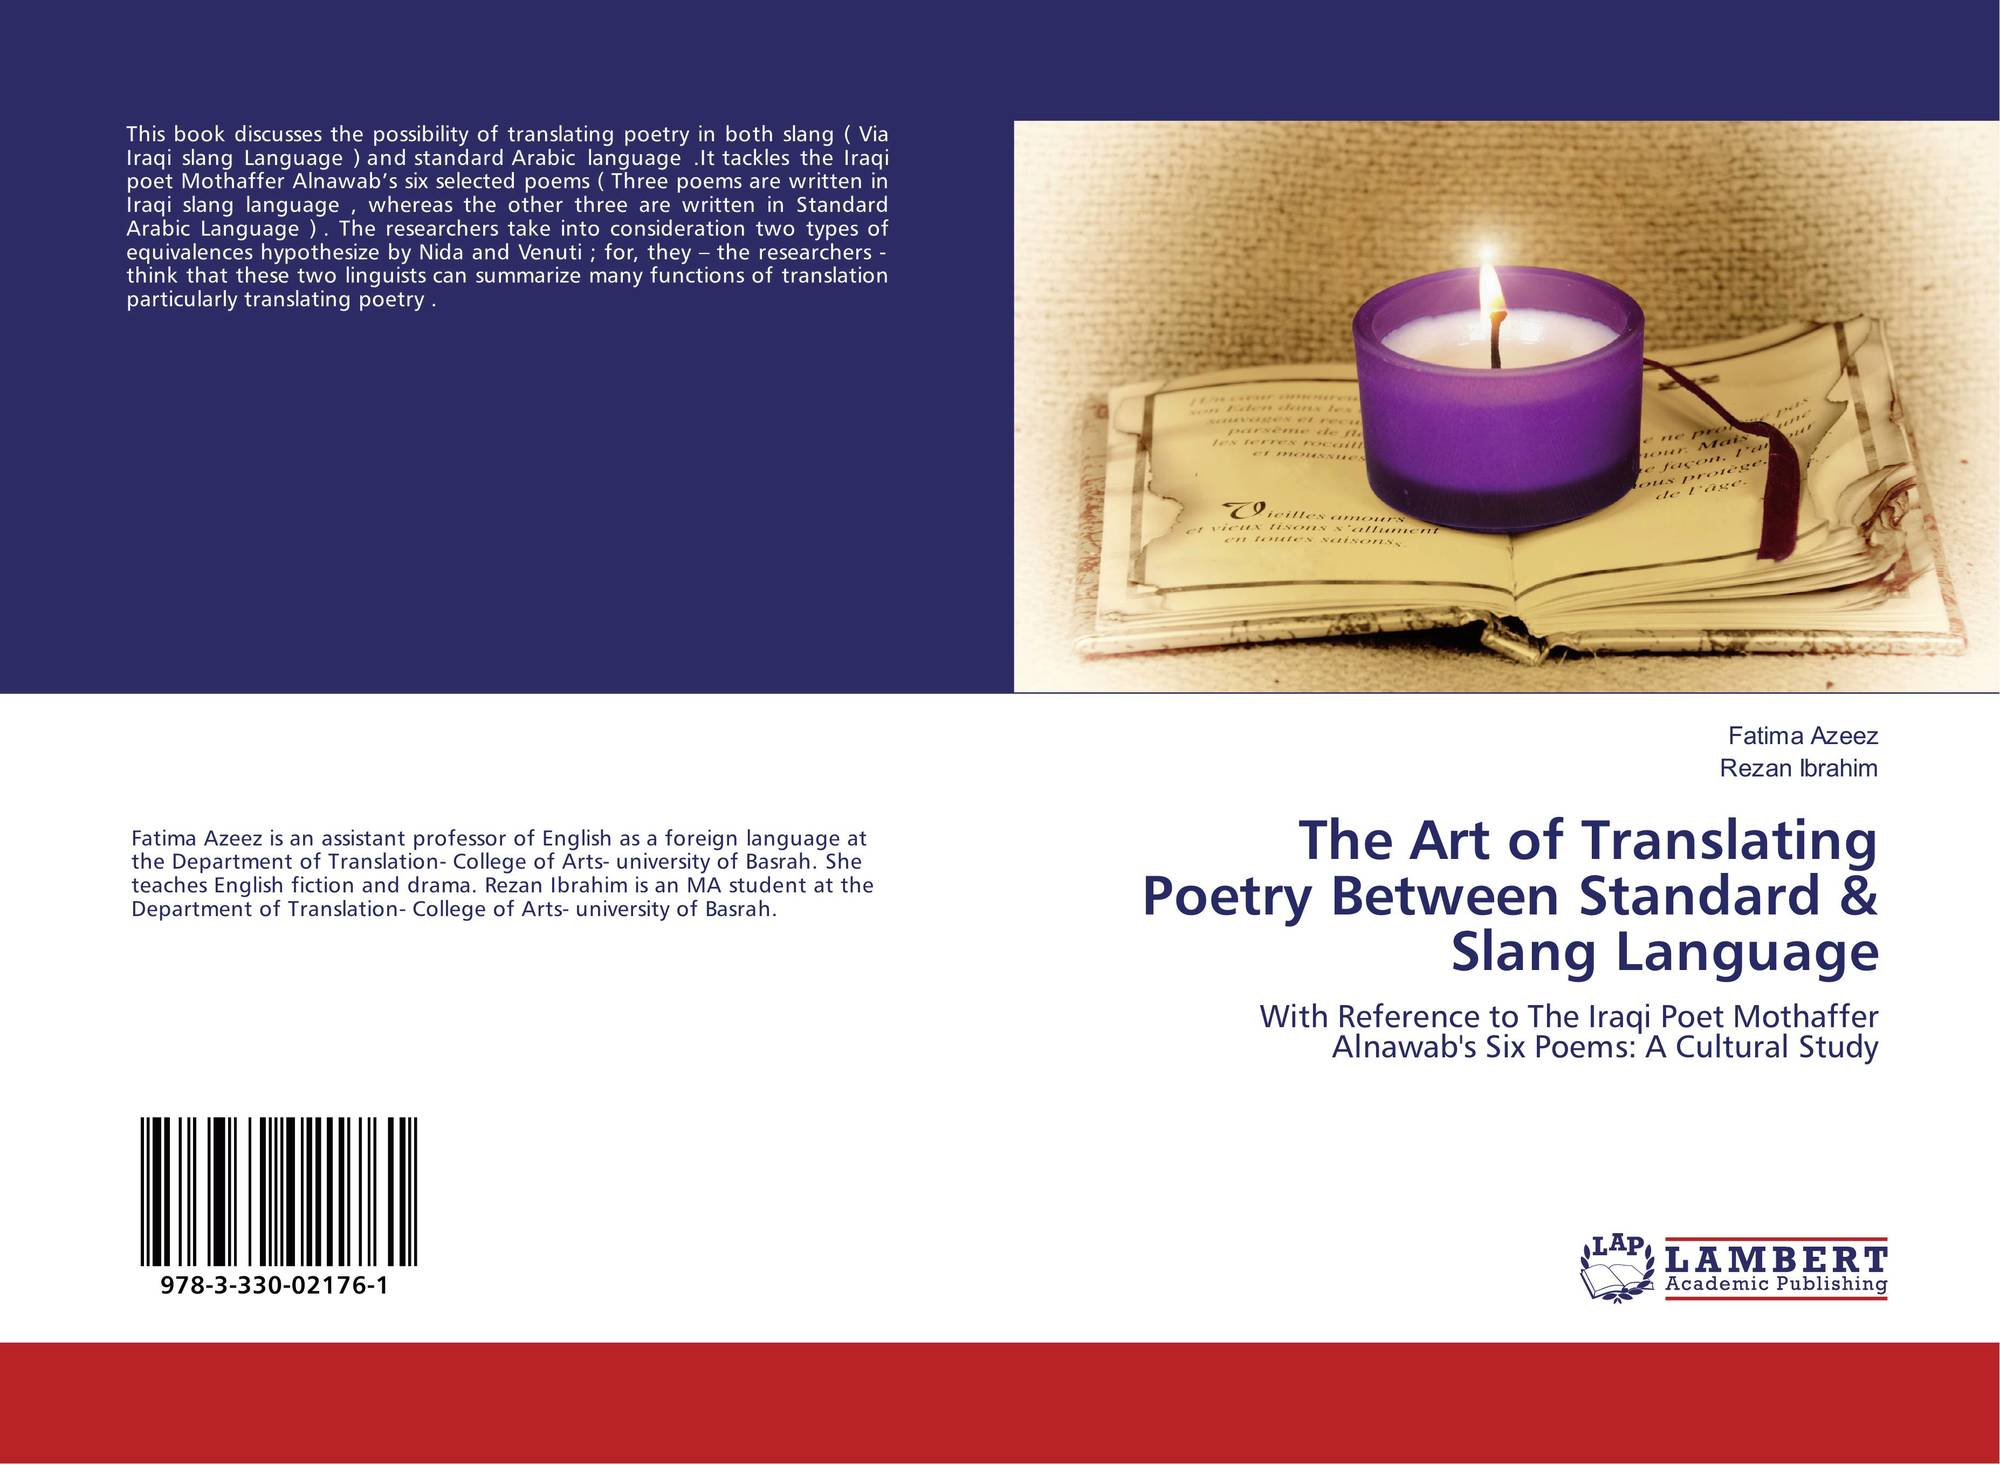 Bookcover of The Art of Translating Poetry Between Standard & Slang  Language. 9783330021761